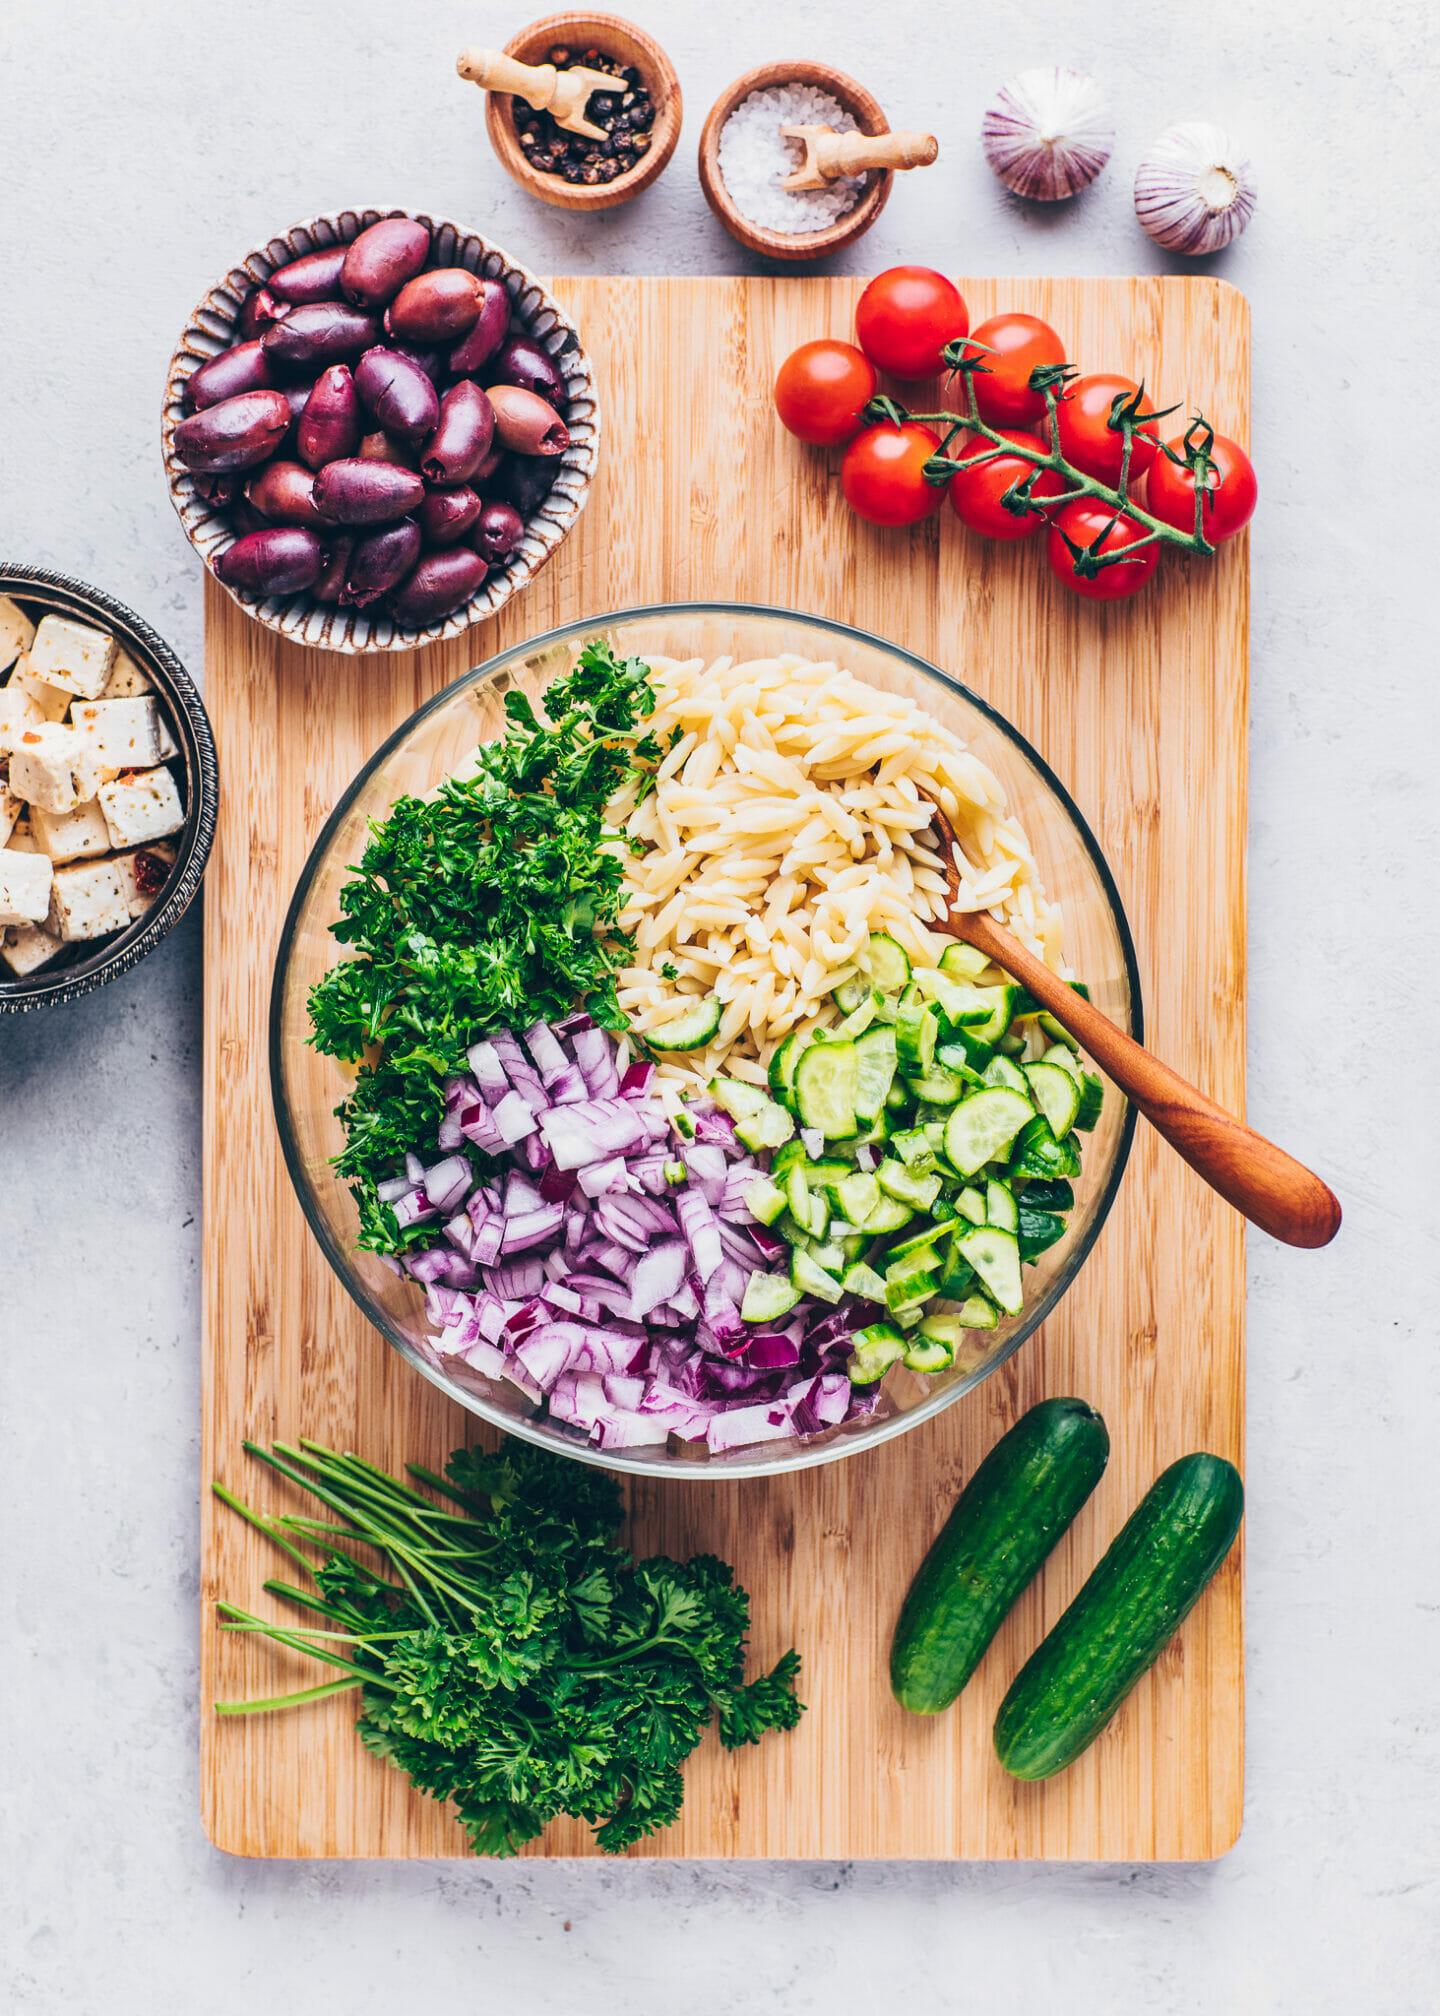 orzo pasta, kalamata oliven, cucumber, tomatoes, onion, parsley, lemon for salad